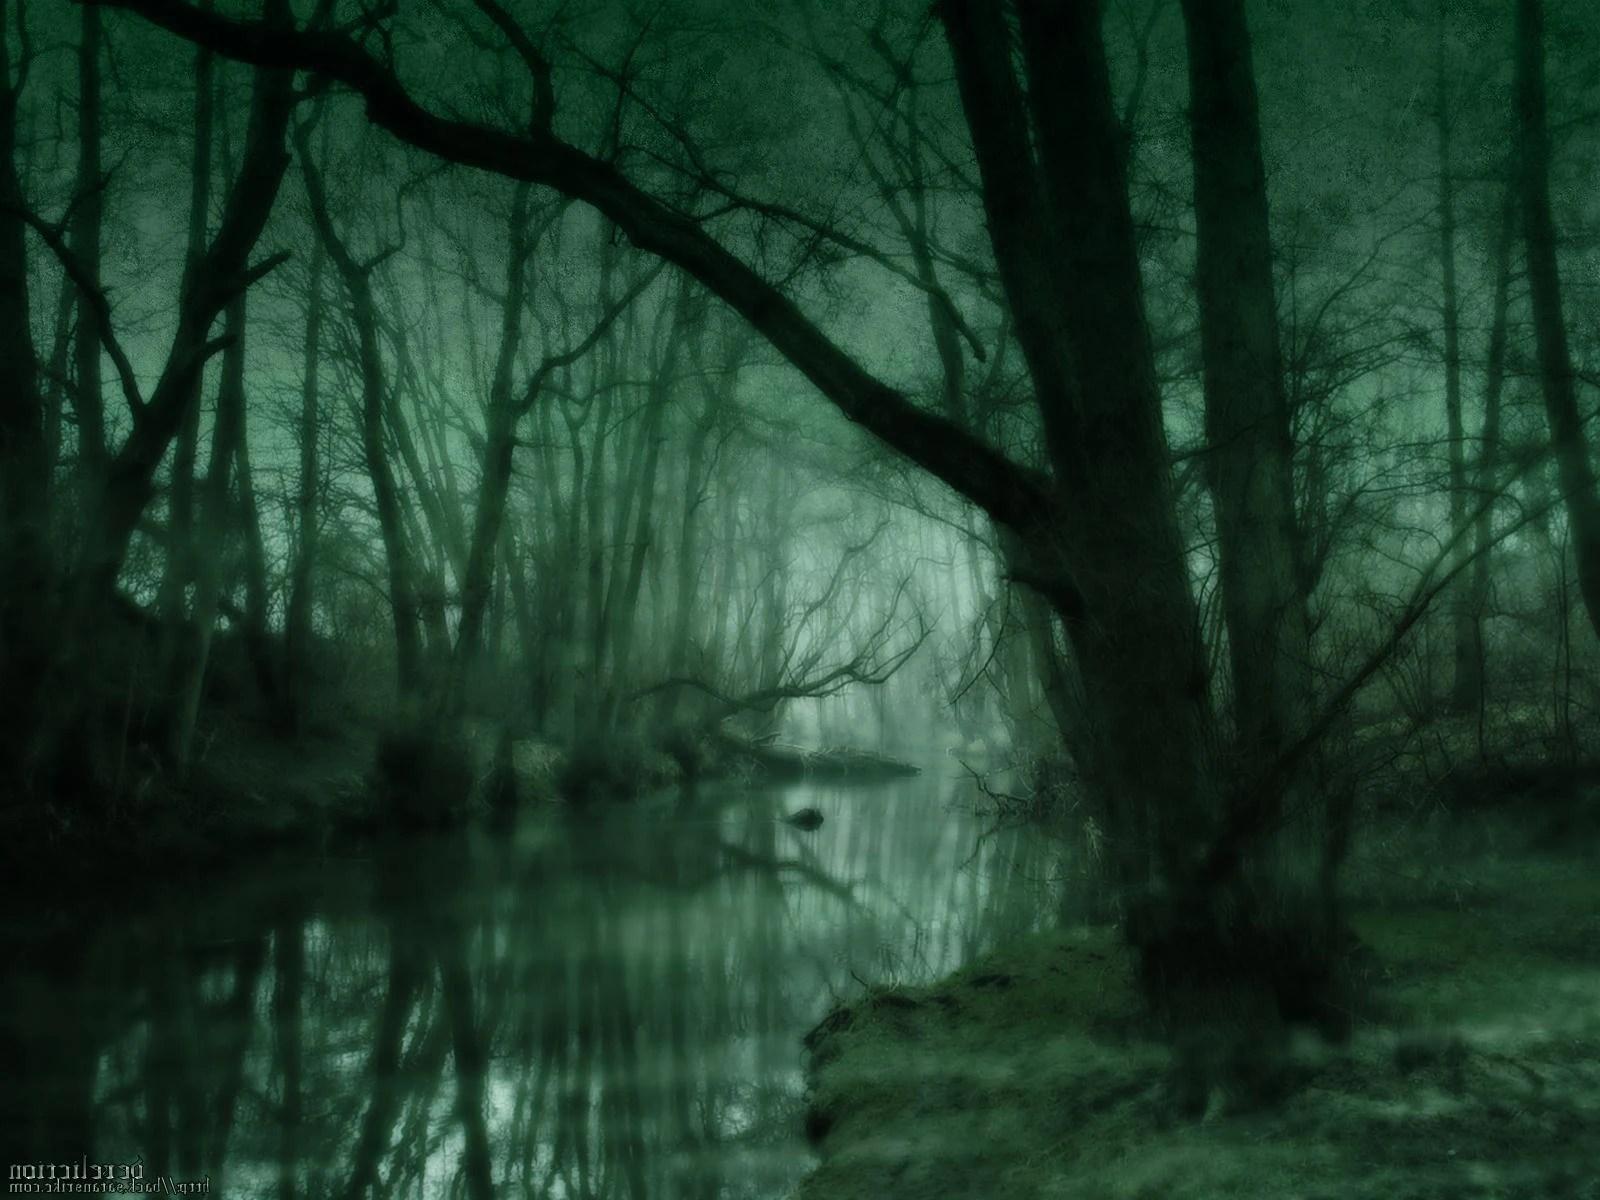 Car Manipulation Wallpapers Smokee Image The Dark Swamp Mystery Fantasy Green Art Hd